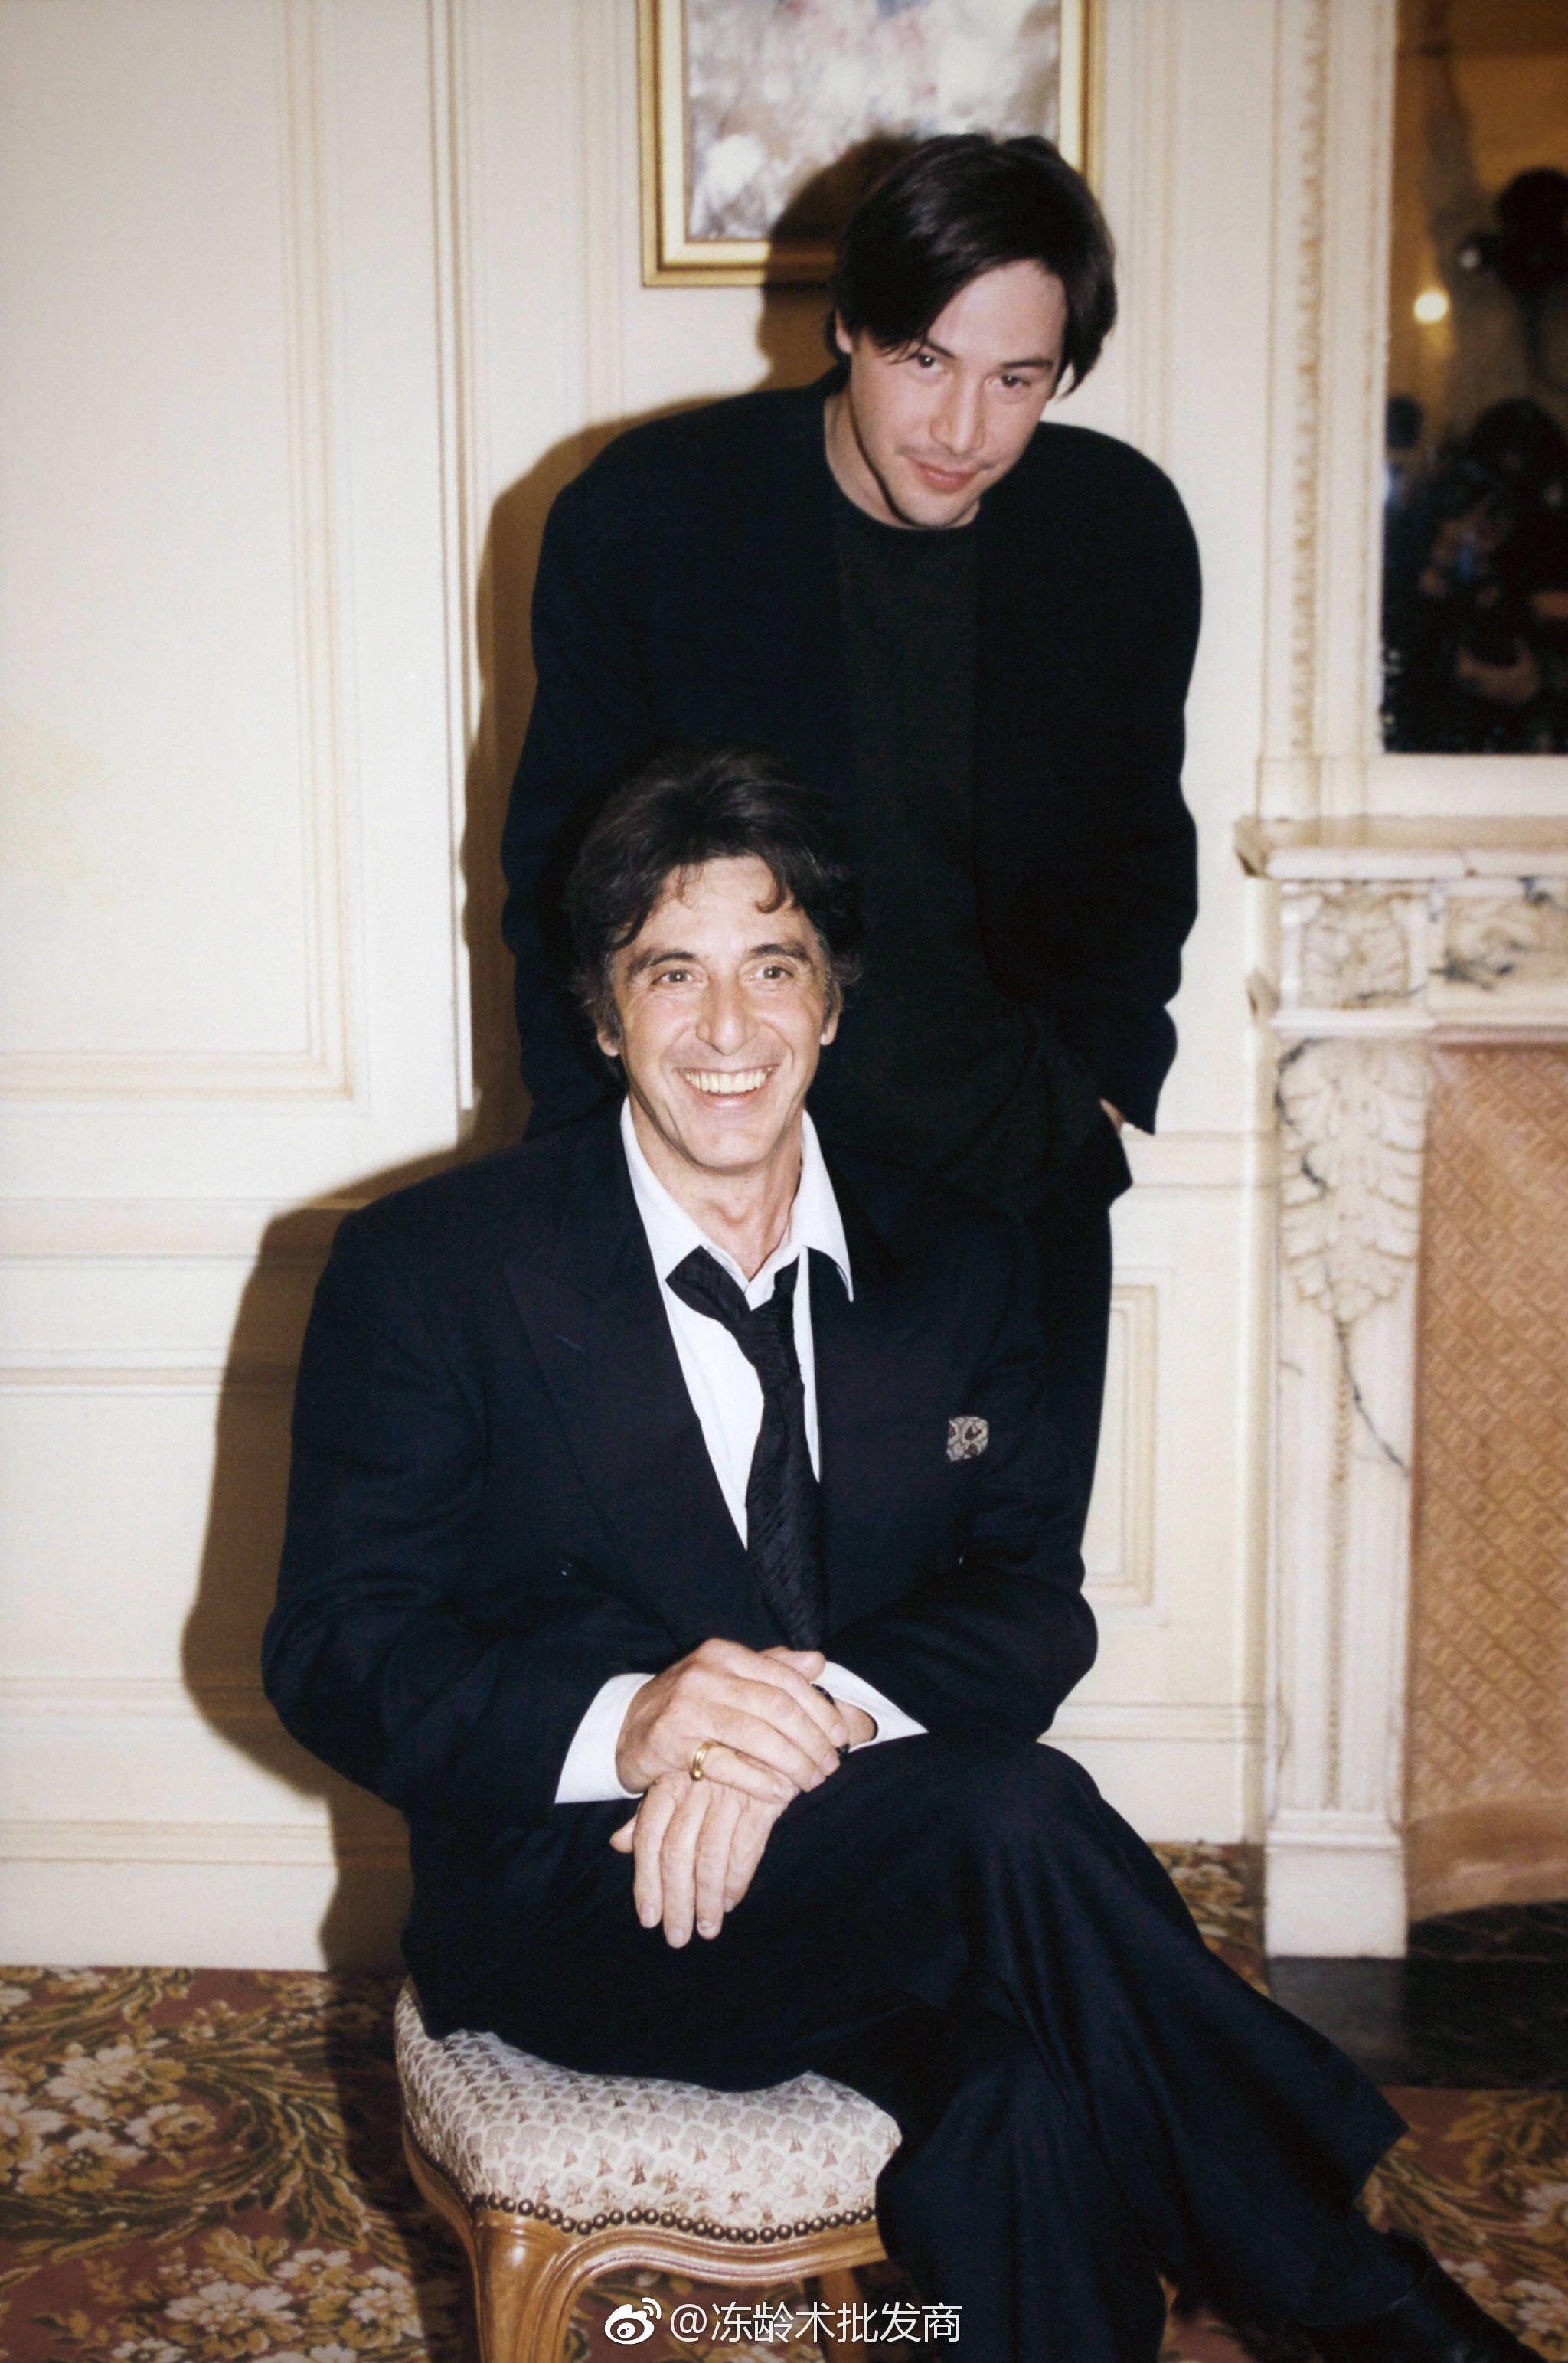 Pin By Mastermind On Al Pacino Keanu Reeves Al Pacino